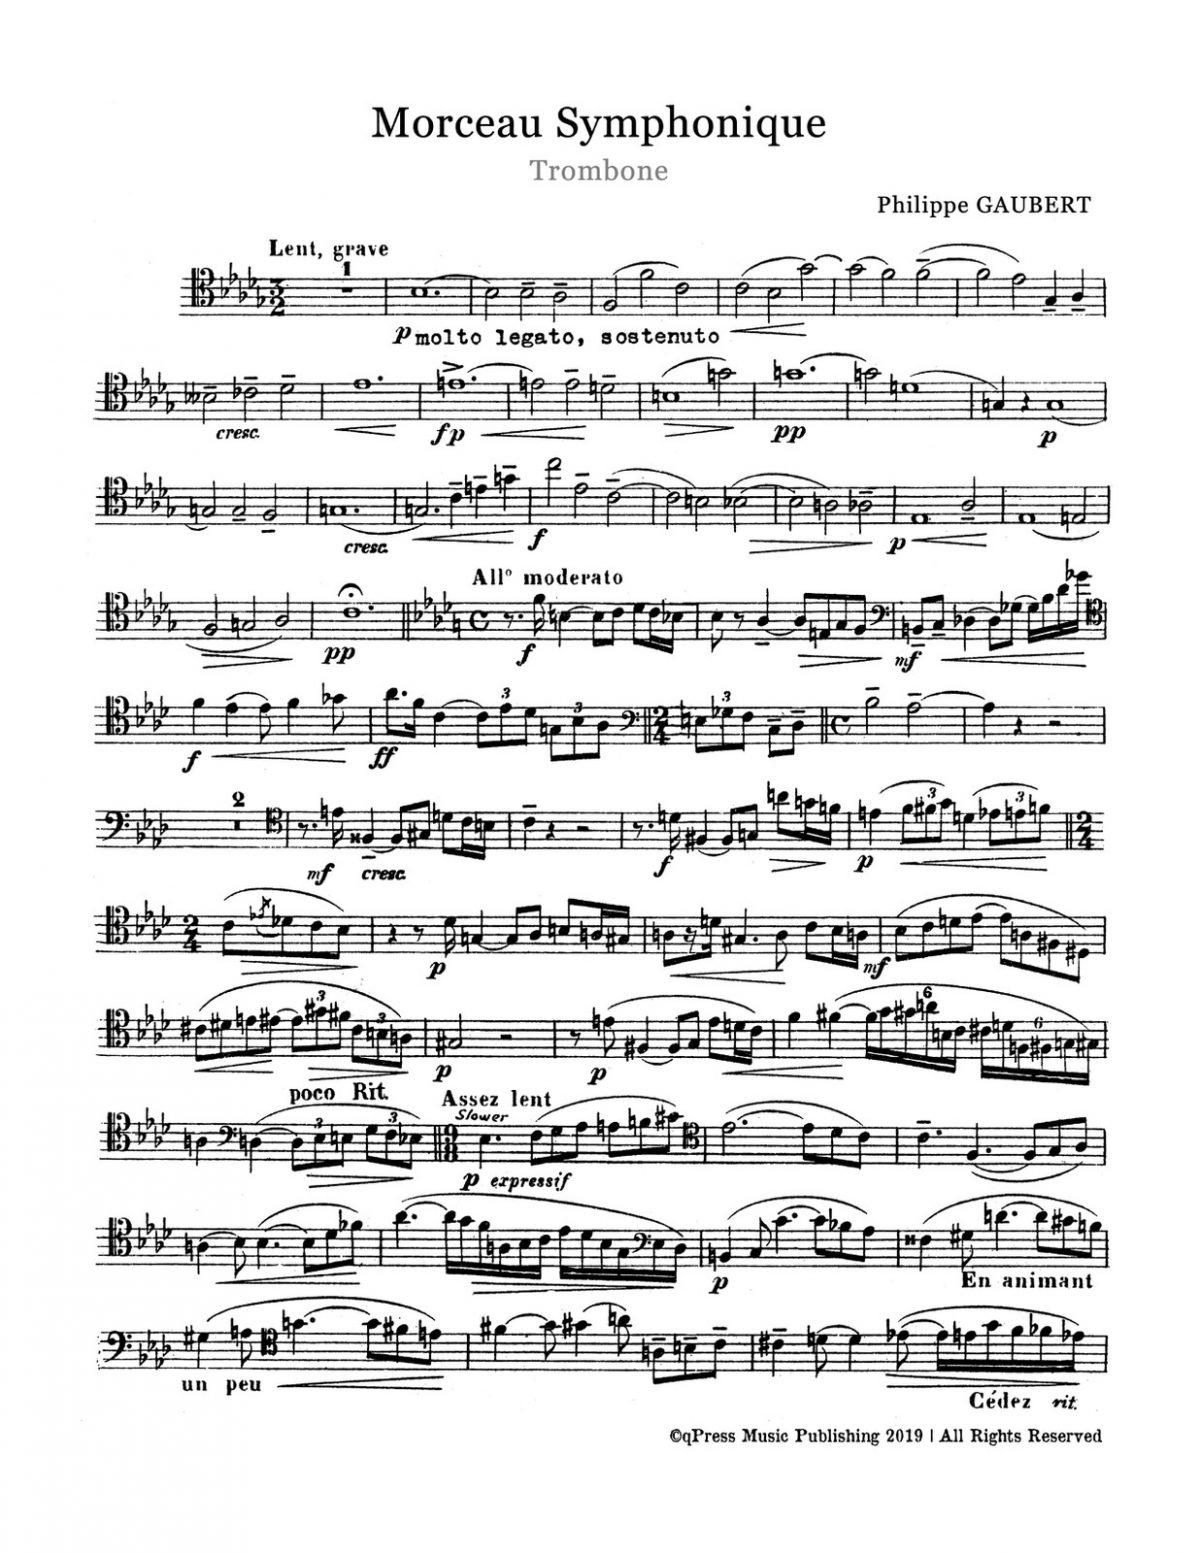 Gaubert, Morceau Symphonique-p03